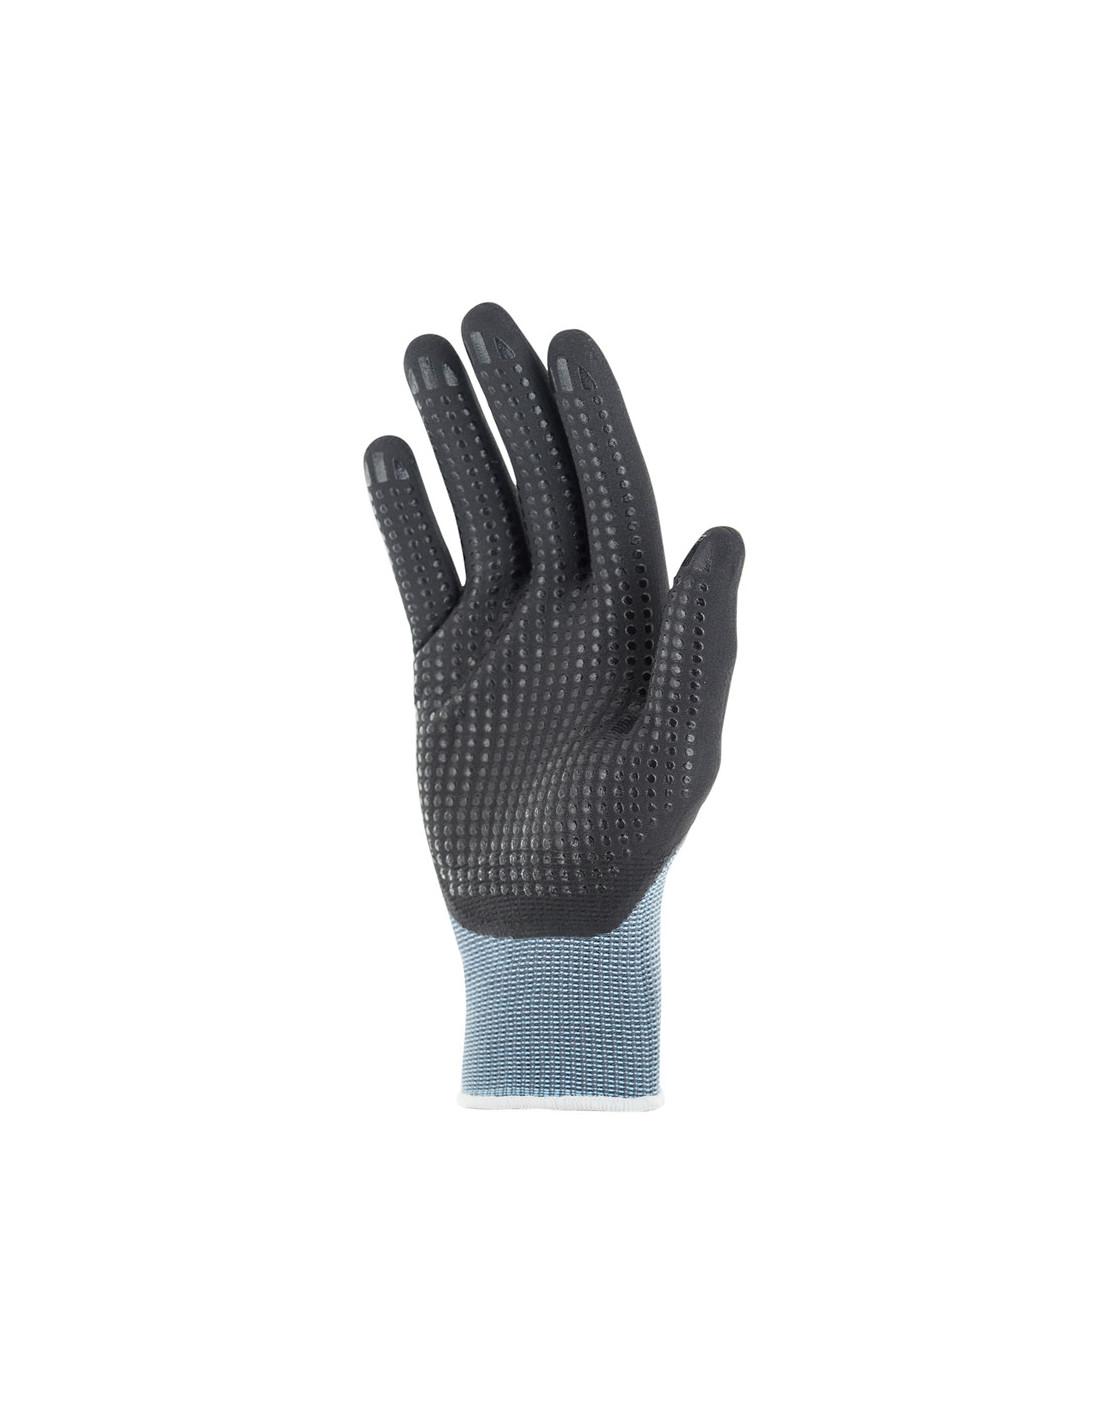 blackfox gants de jardinage tactil noir taille 8 hyper brico. Black Bedroom Furniture Sets. Home Design Ideas